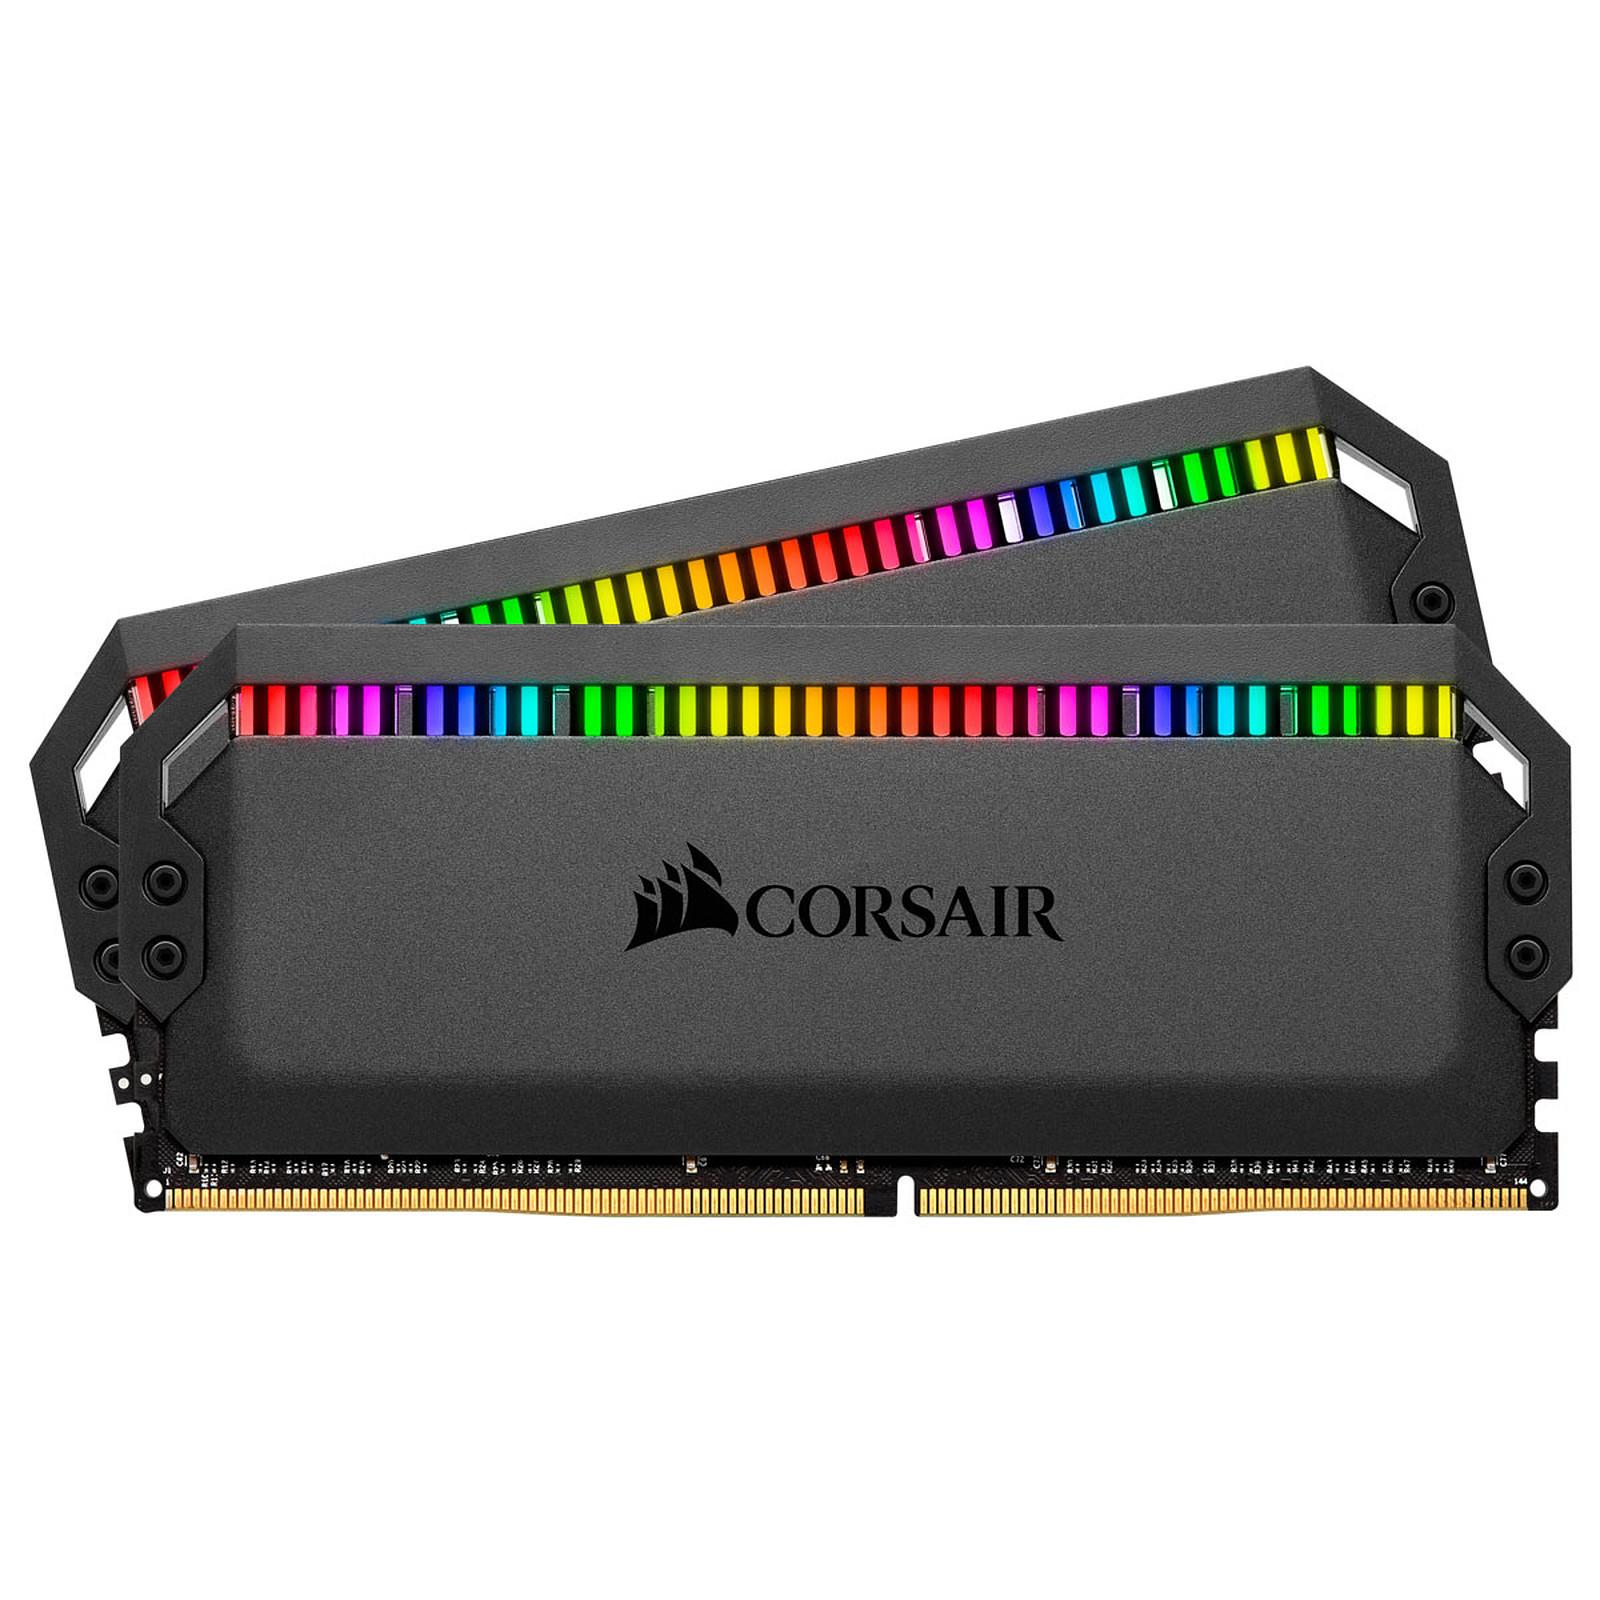 Corsair Dominator Platinum RGB 32 GB (2 x 16 GB) DDR4 3200 MHz CL16